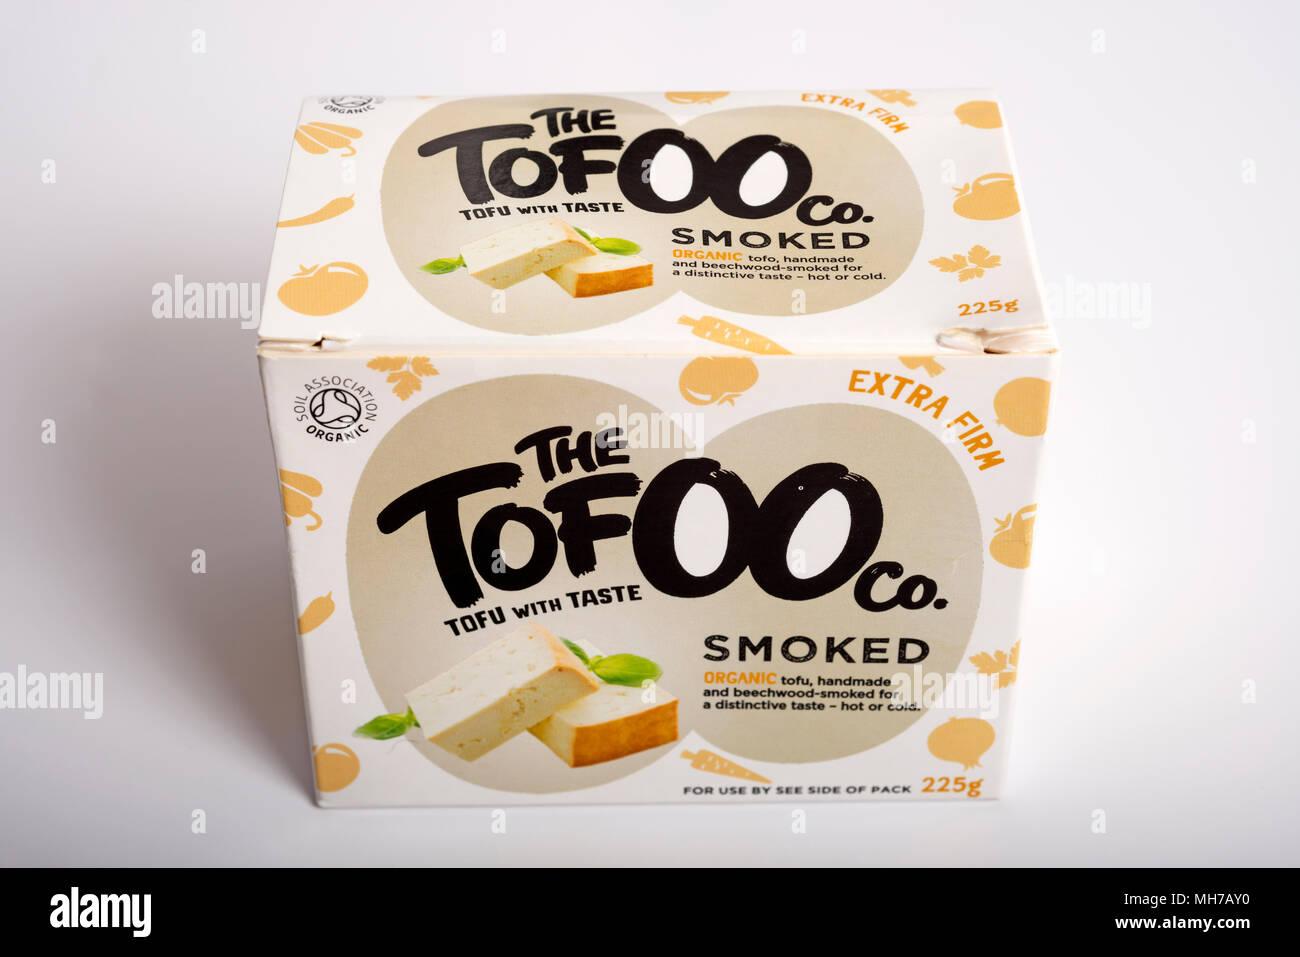 The Tofoo company smoked organic tofu - Stock Image